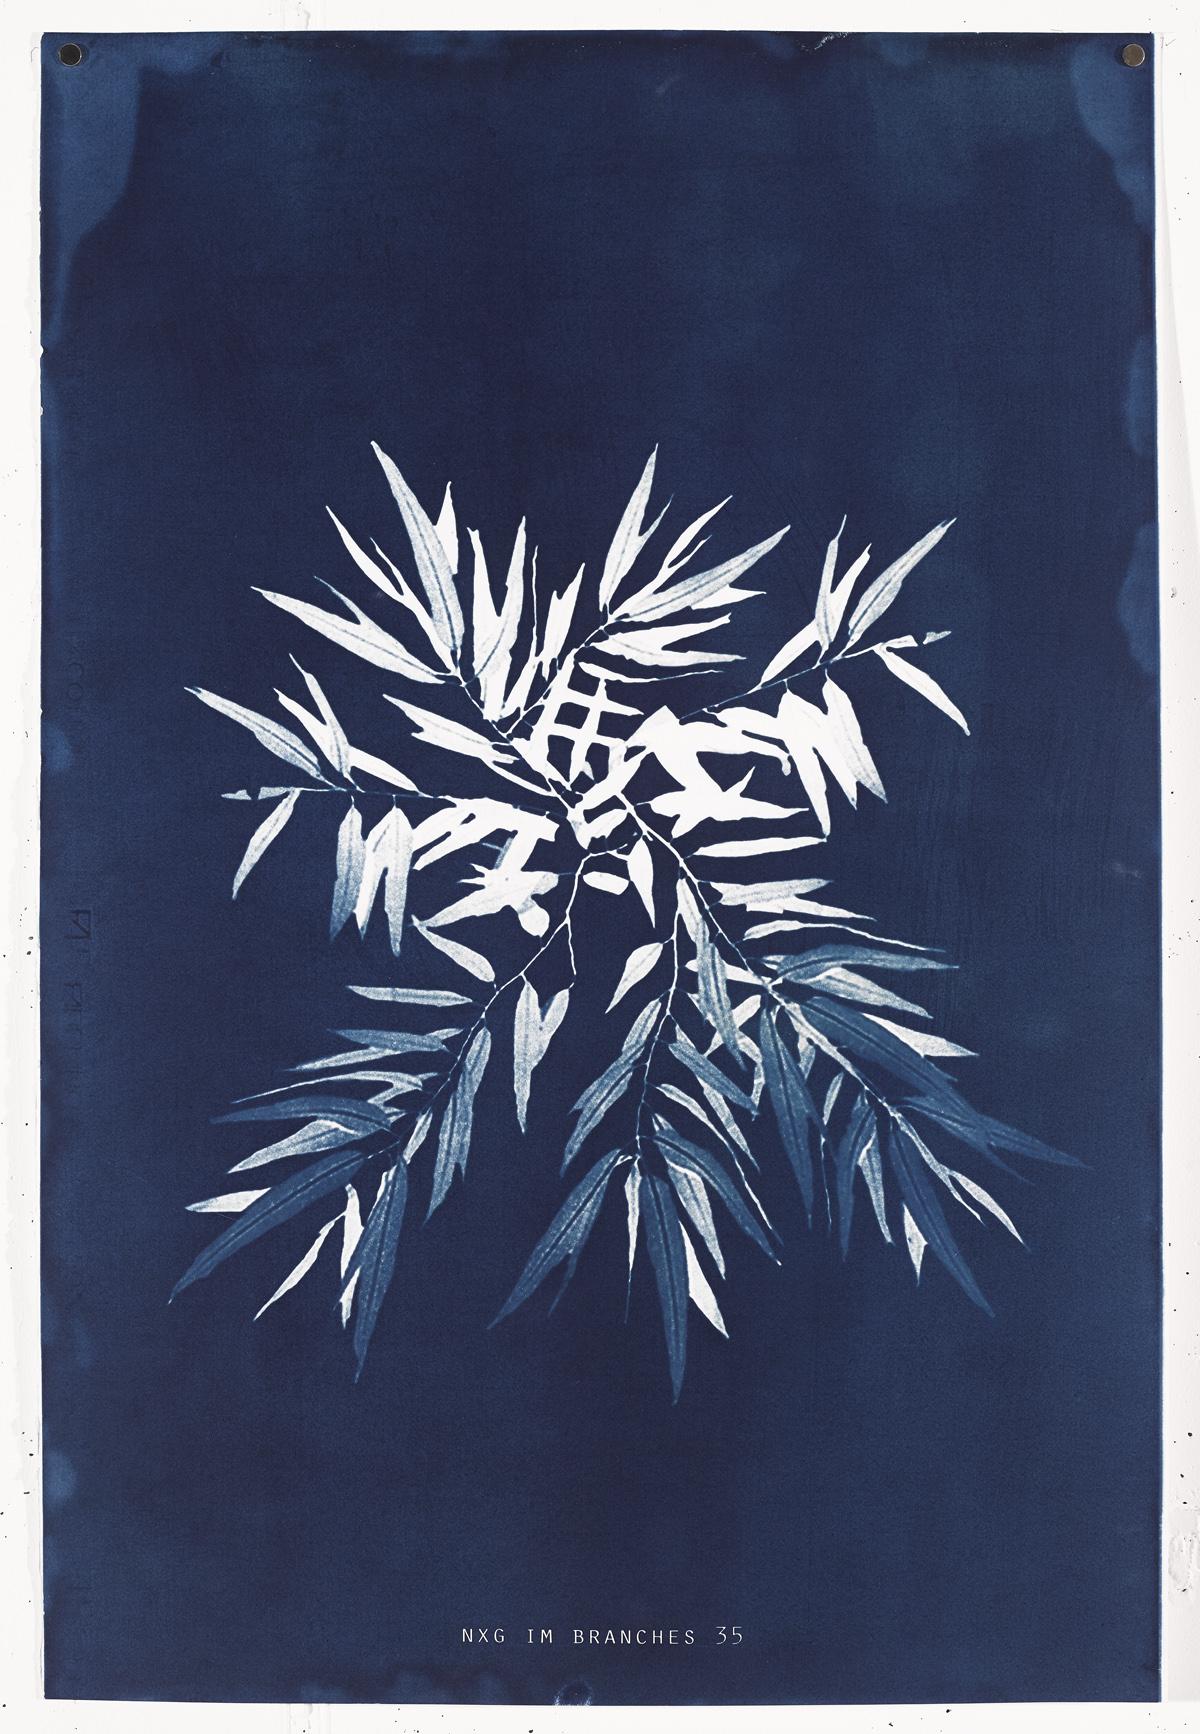 NXG_IM_BRANCHES_35 , Unique cyanotype print on Fabriano No.5, 90.4 x 61 cm, 2017.